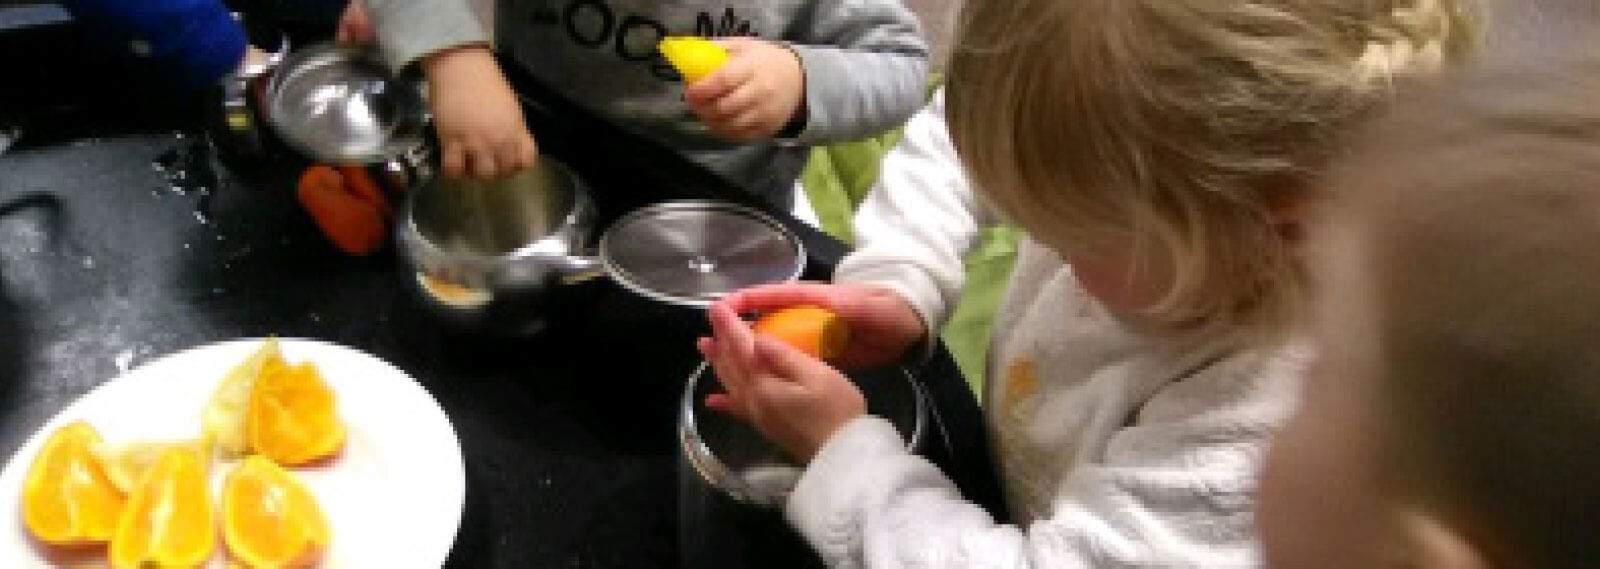 Healthy, Homemade Meals - Menu - Enchanted Garden Day Nursery Mansfield